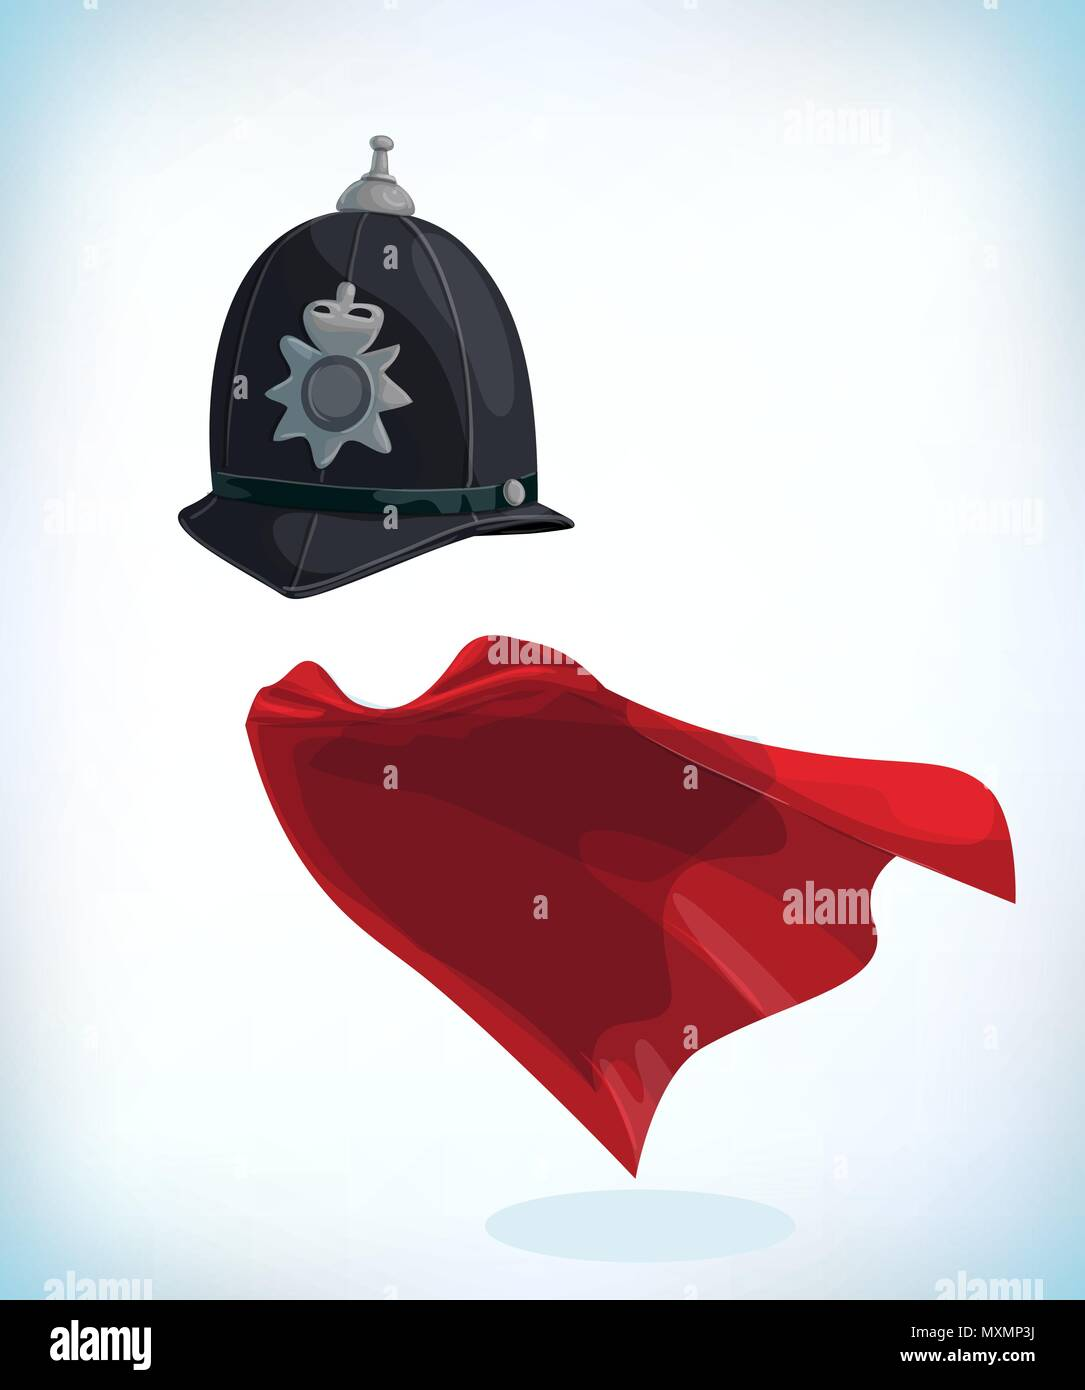 Policeman Helmet Stockfotos & Policeman Helmet Bilder - Alamy